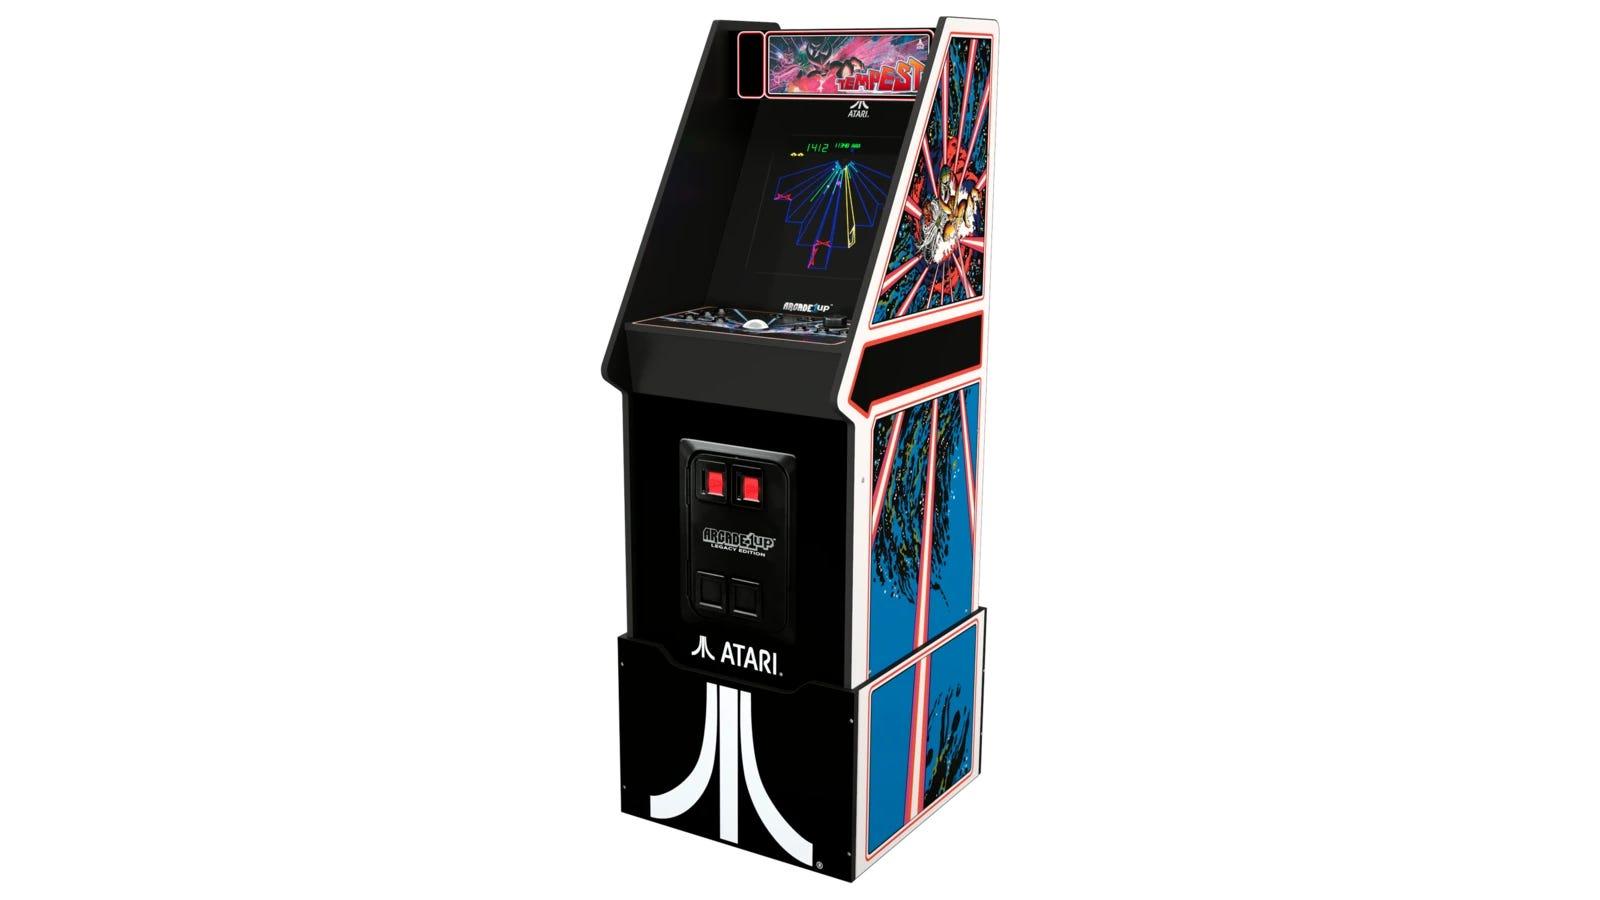 Atari Legacy Edition Arcade Machine